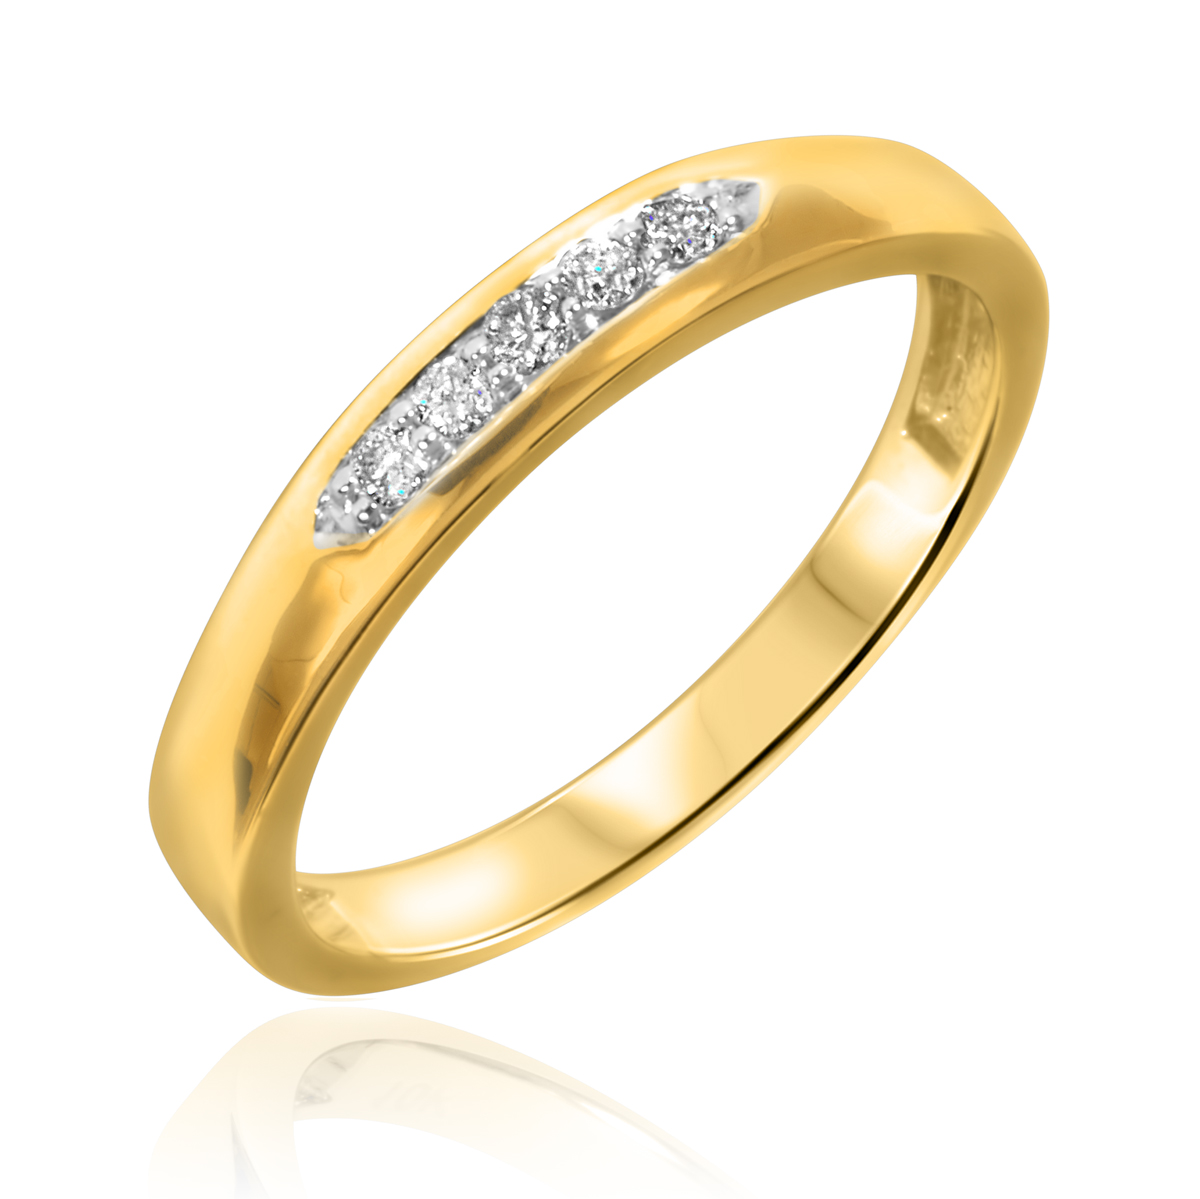 1/10 Carat T.W. Round Cut Diamond Ladies Wedding Band 14K Yellow Gold- Size 8